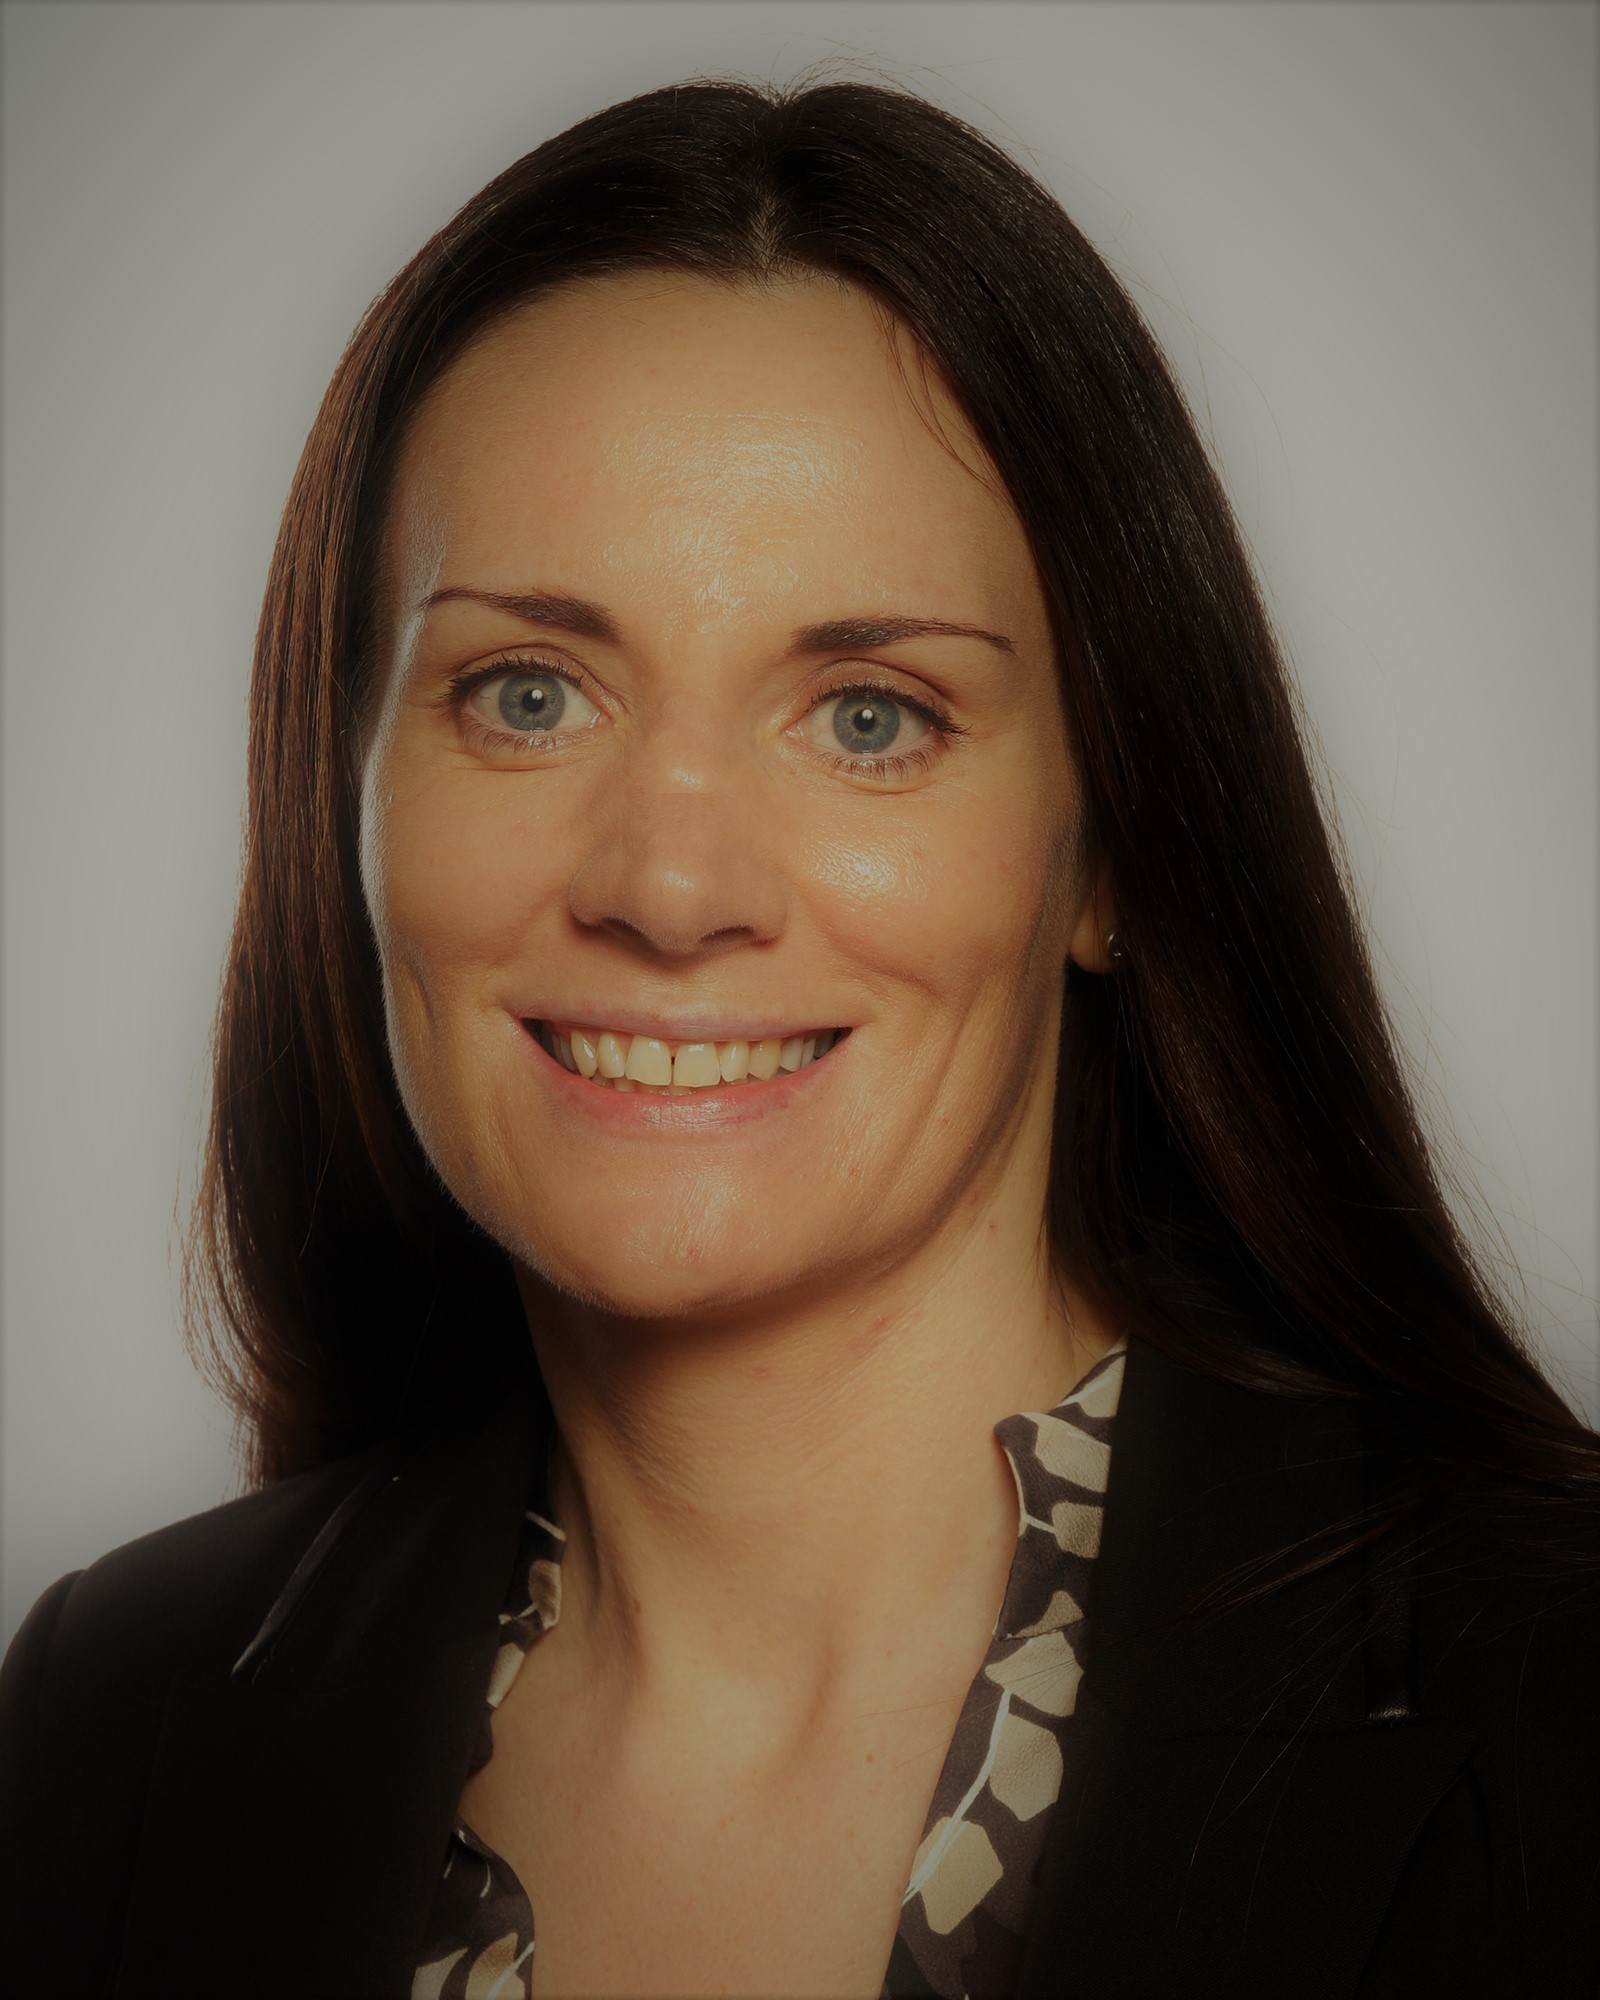 Women Of The Irish Food Industry – Sylvia Wadding, Technical Director